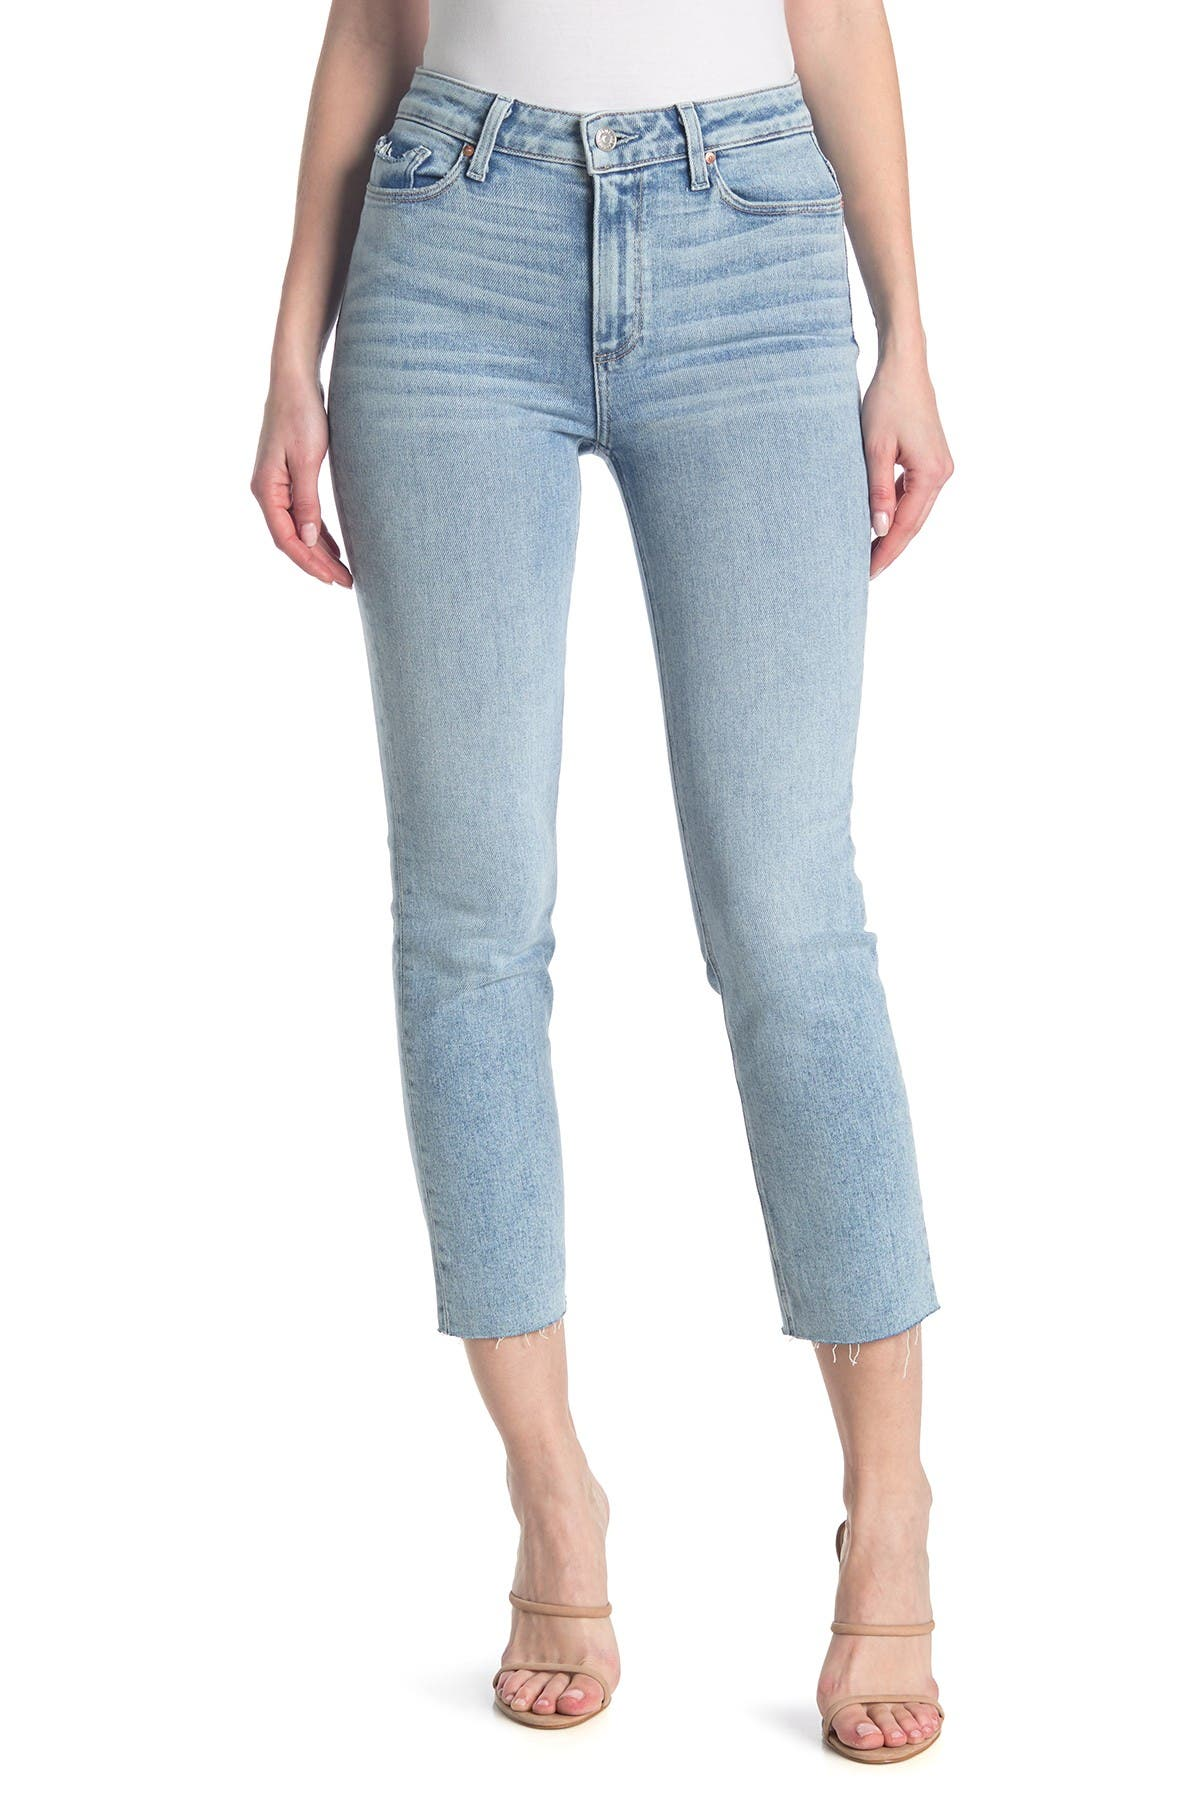 Paige Womens Tari Hoxton Blue Denim High Rise Skinny Crop Jeans 24 BHFO 8259